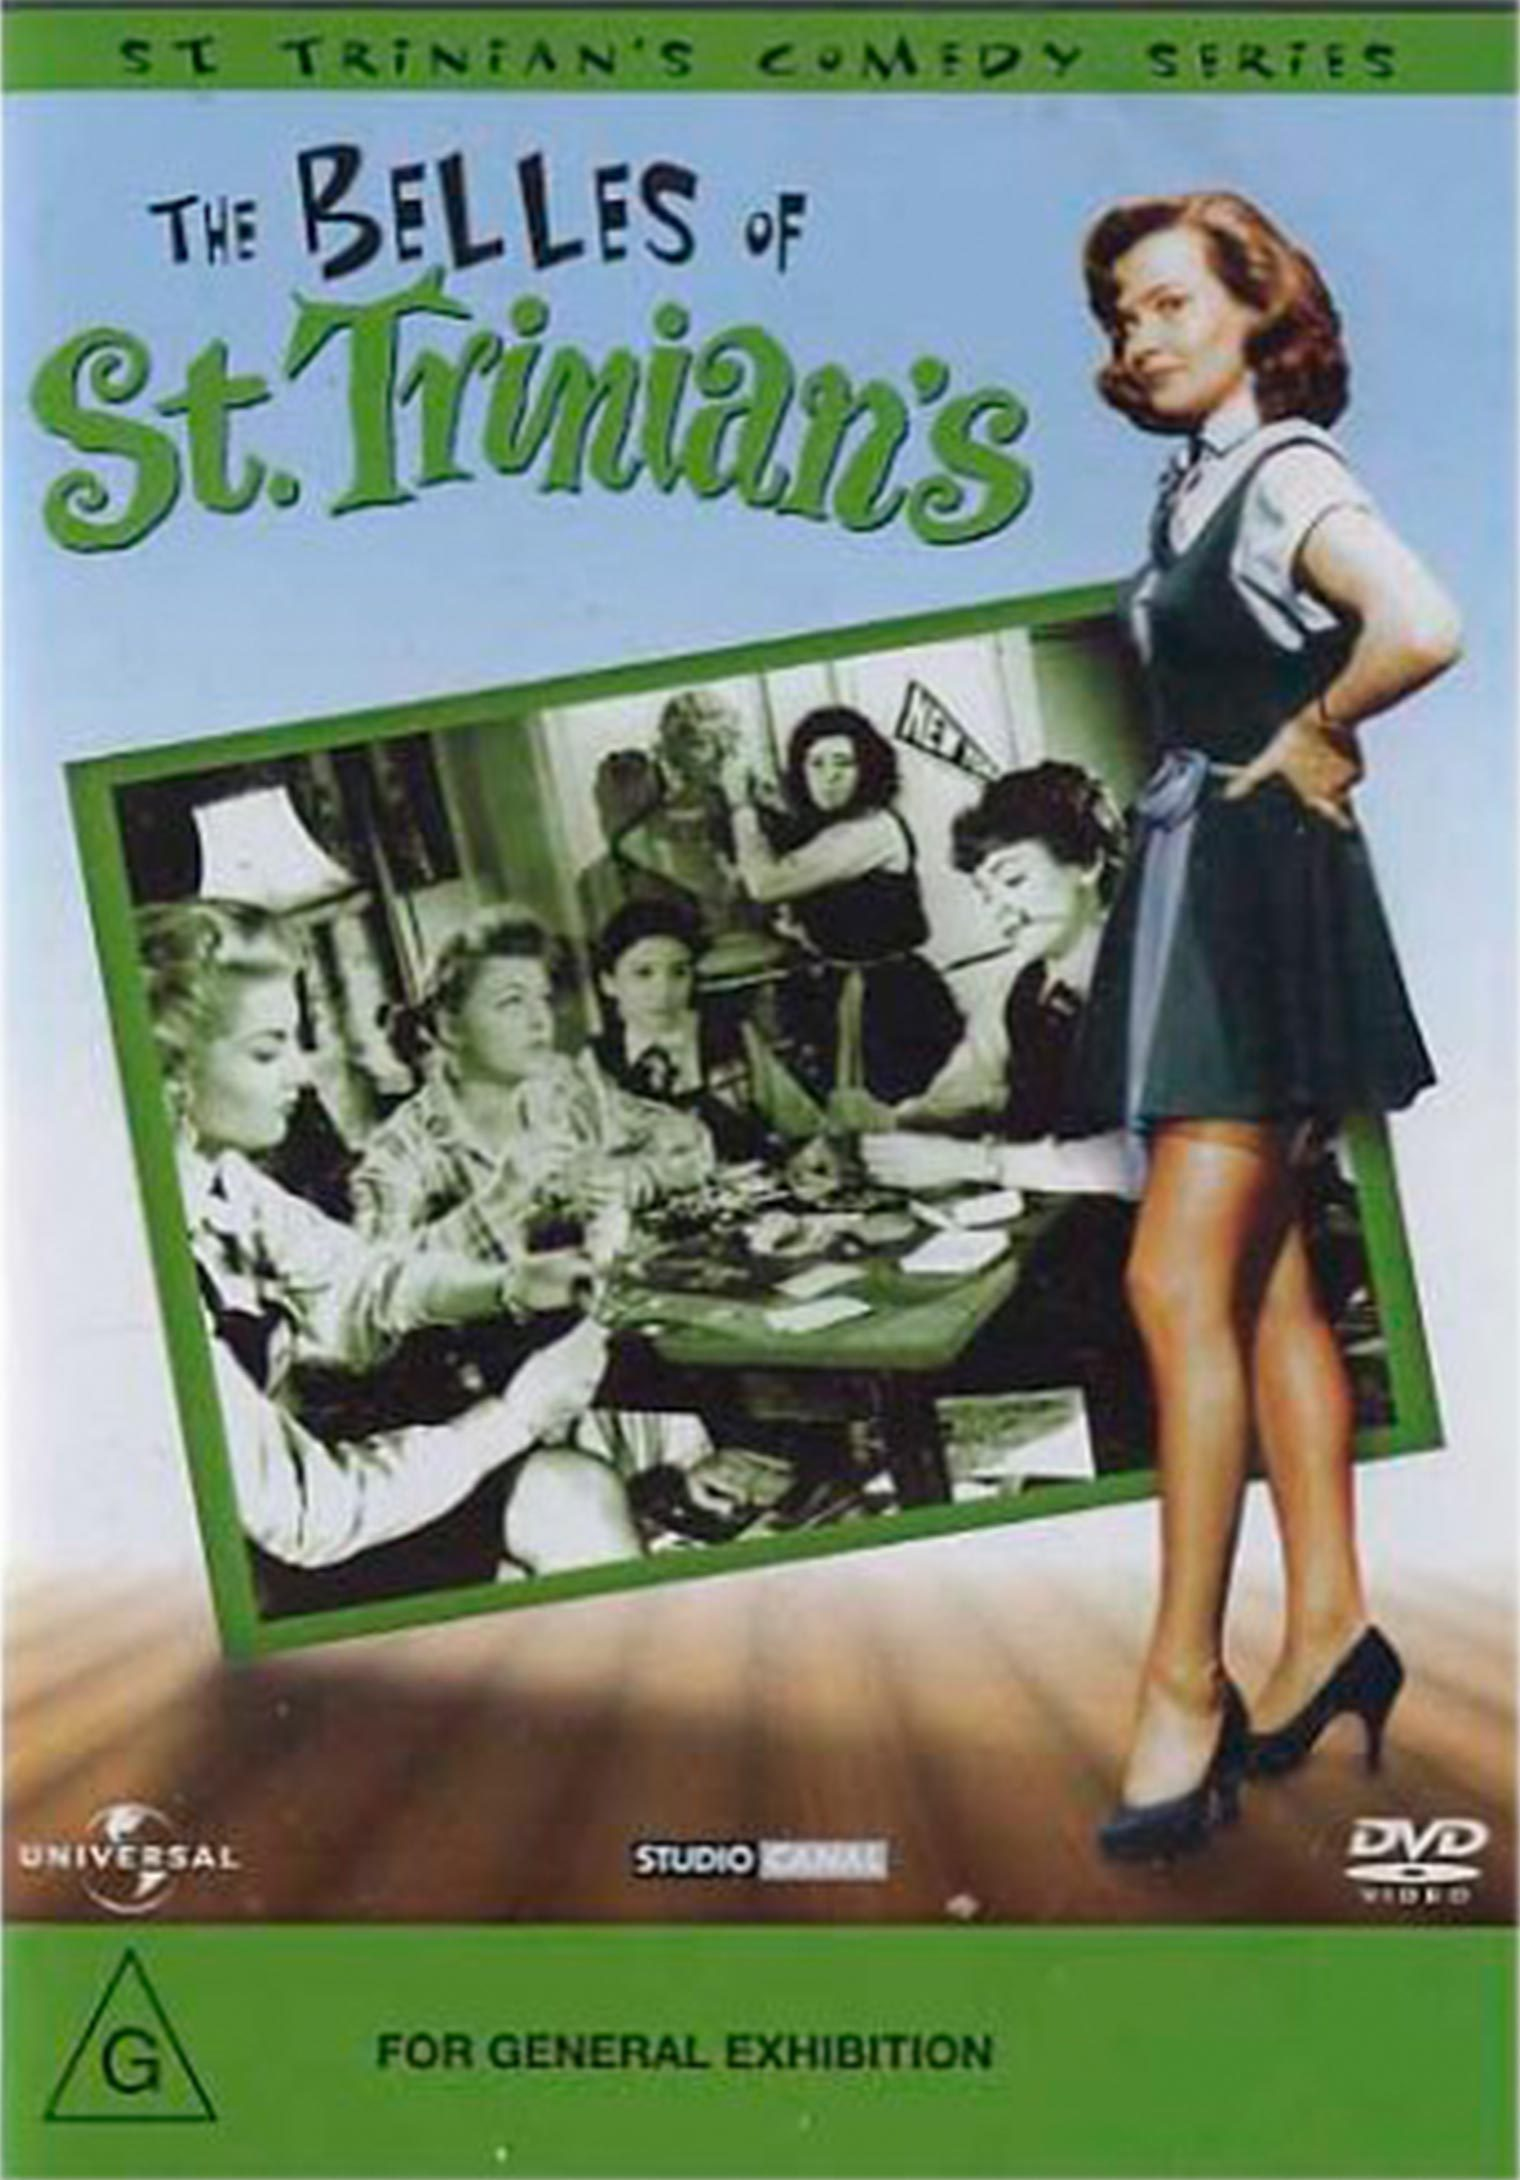 The Belles of St. Trinians